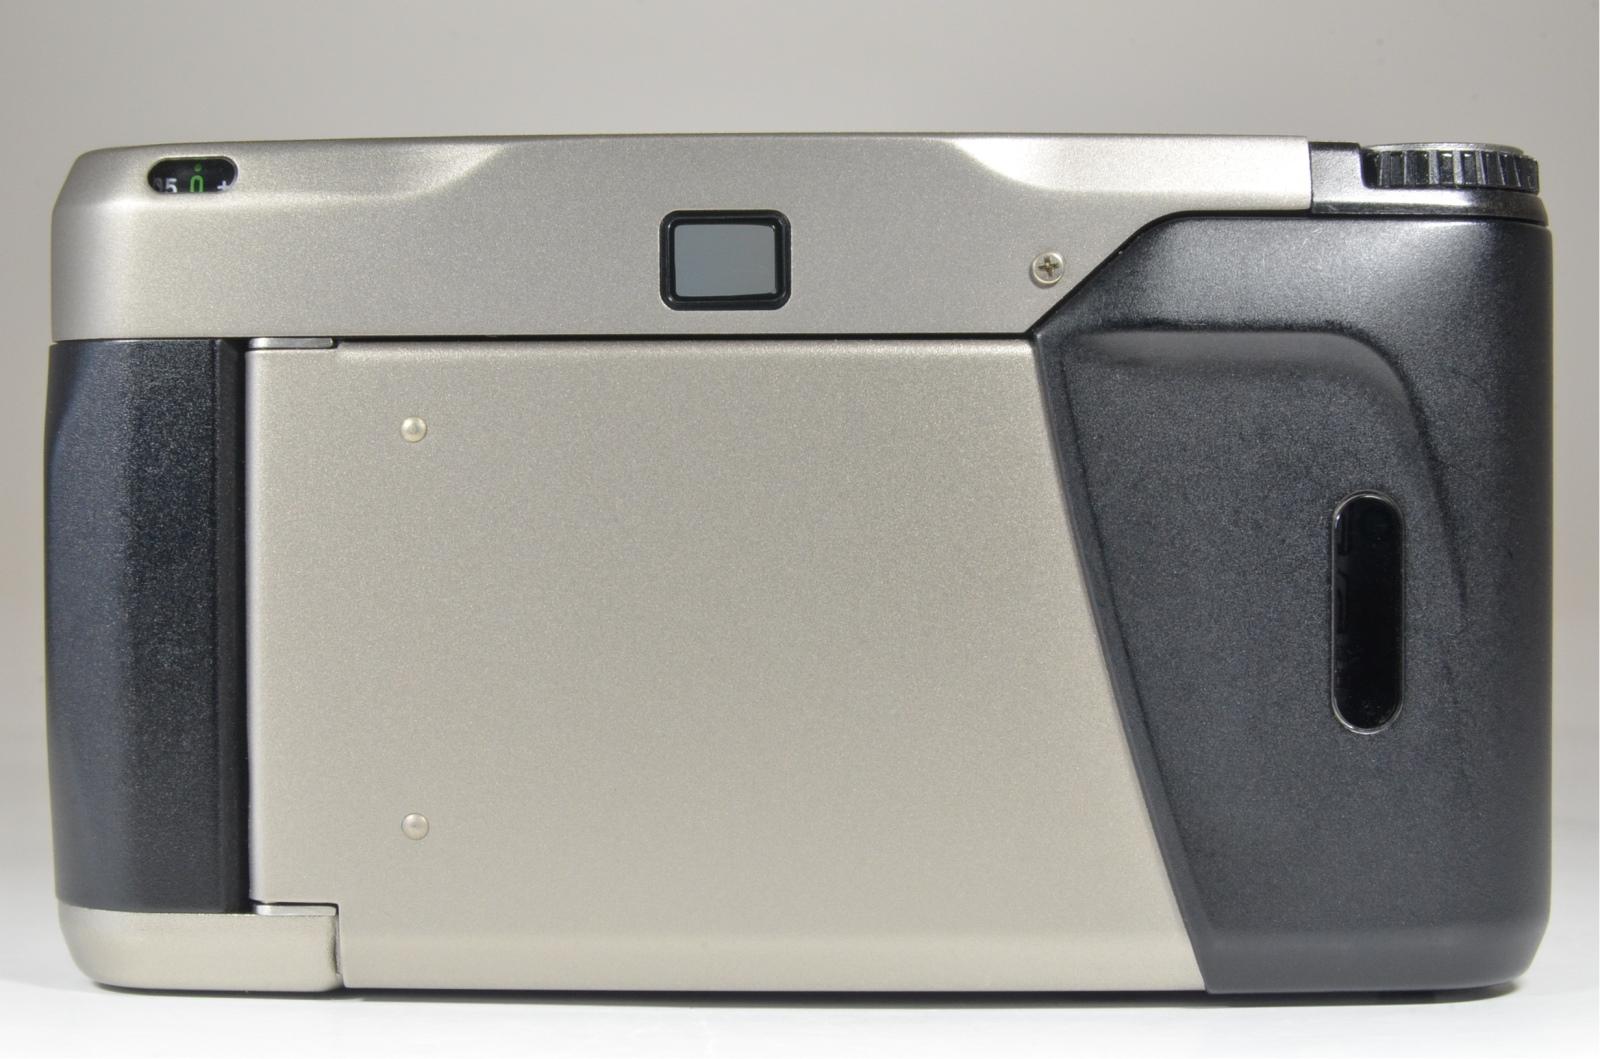 contax t2 titanium silver point & shoot 35mm film camera